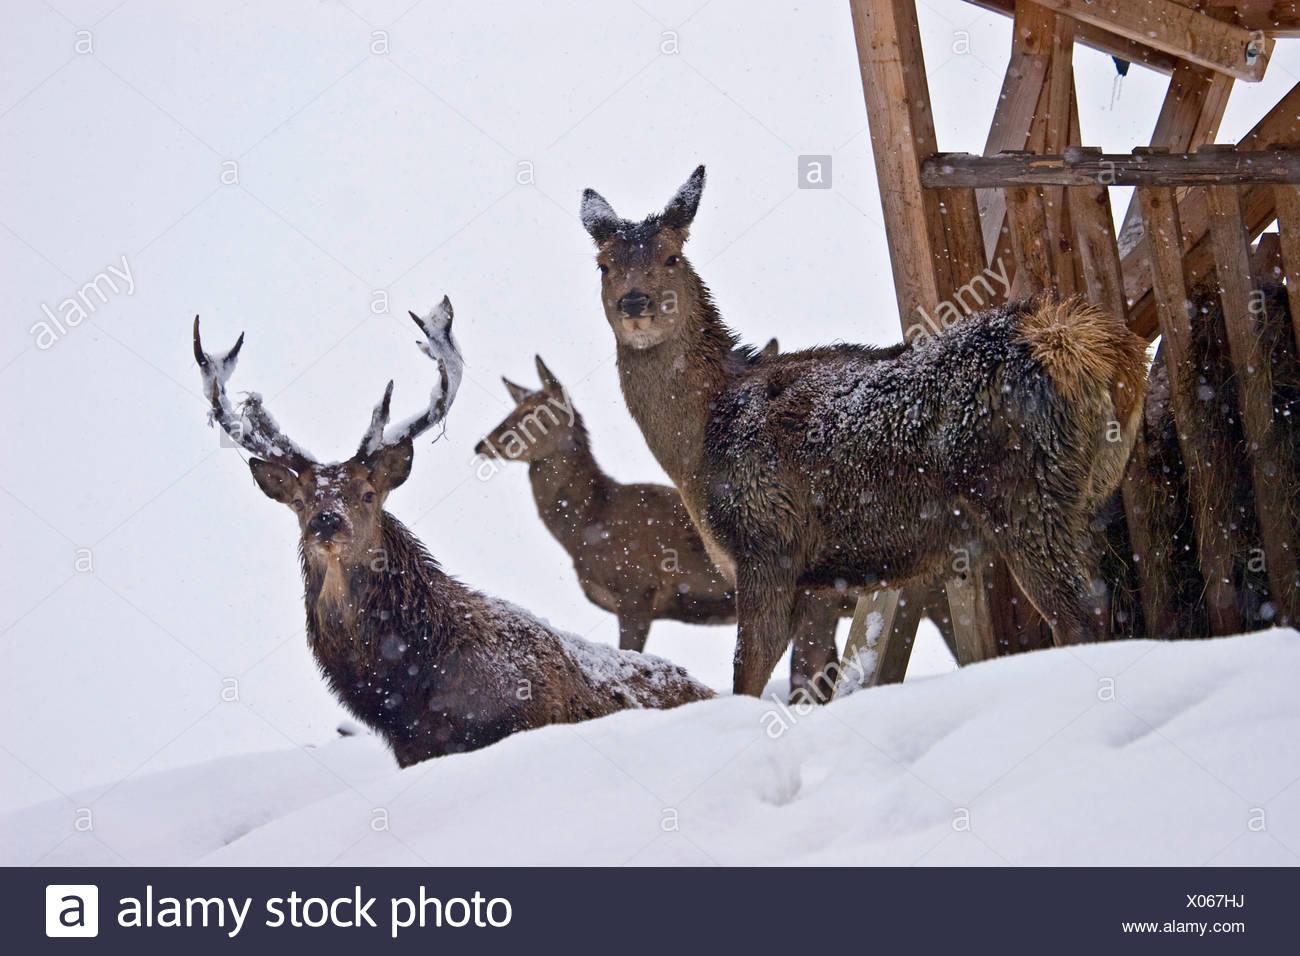 wildfutterung Stock Photo